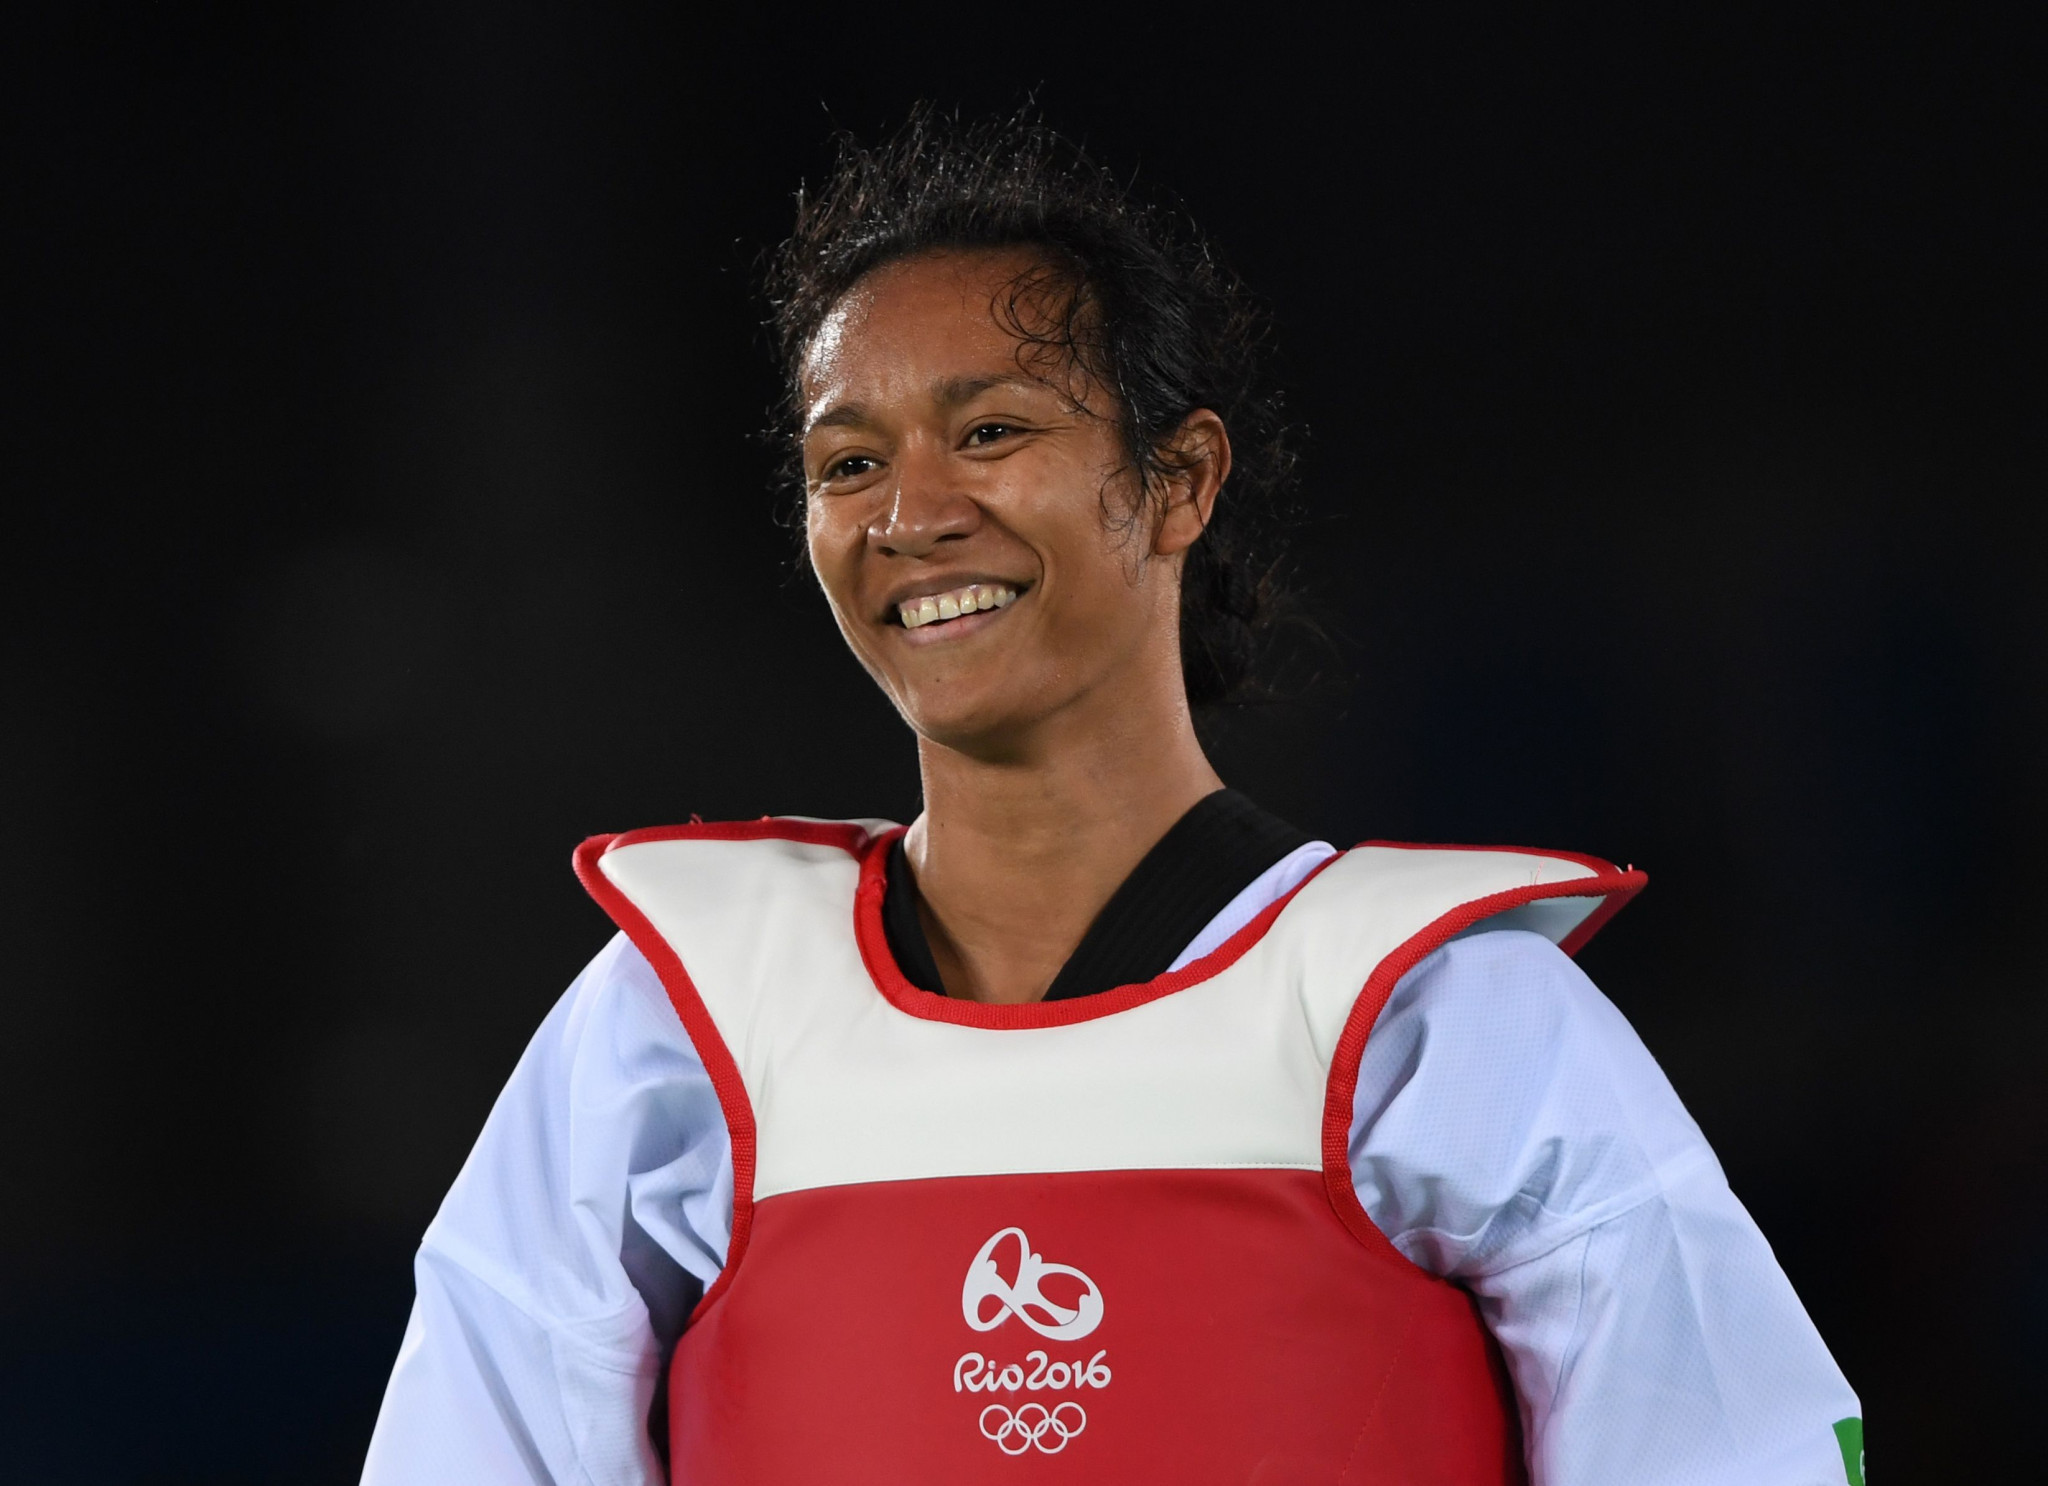 Taekwondo Papua New Guinea President urges athletes to make step up for Tokyo 2020